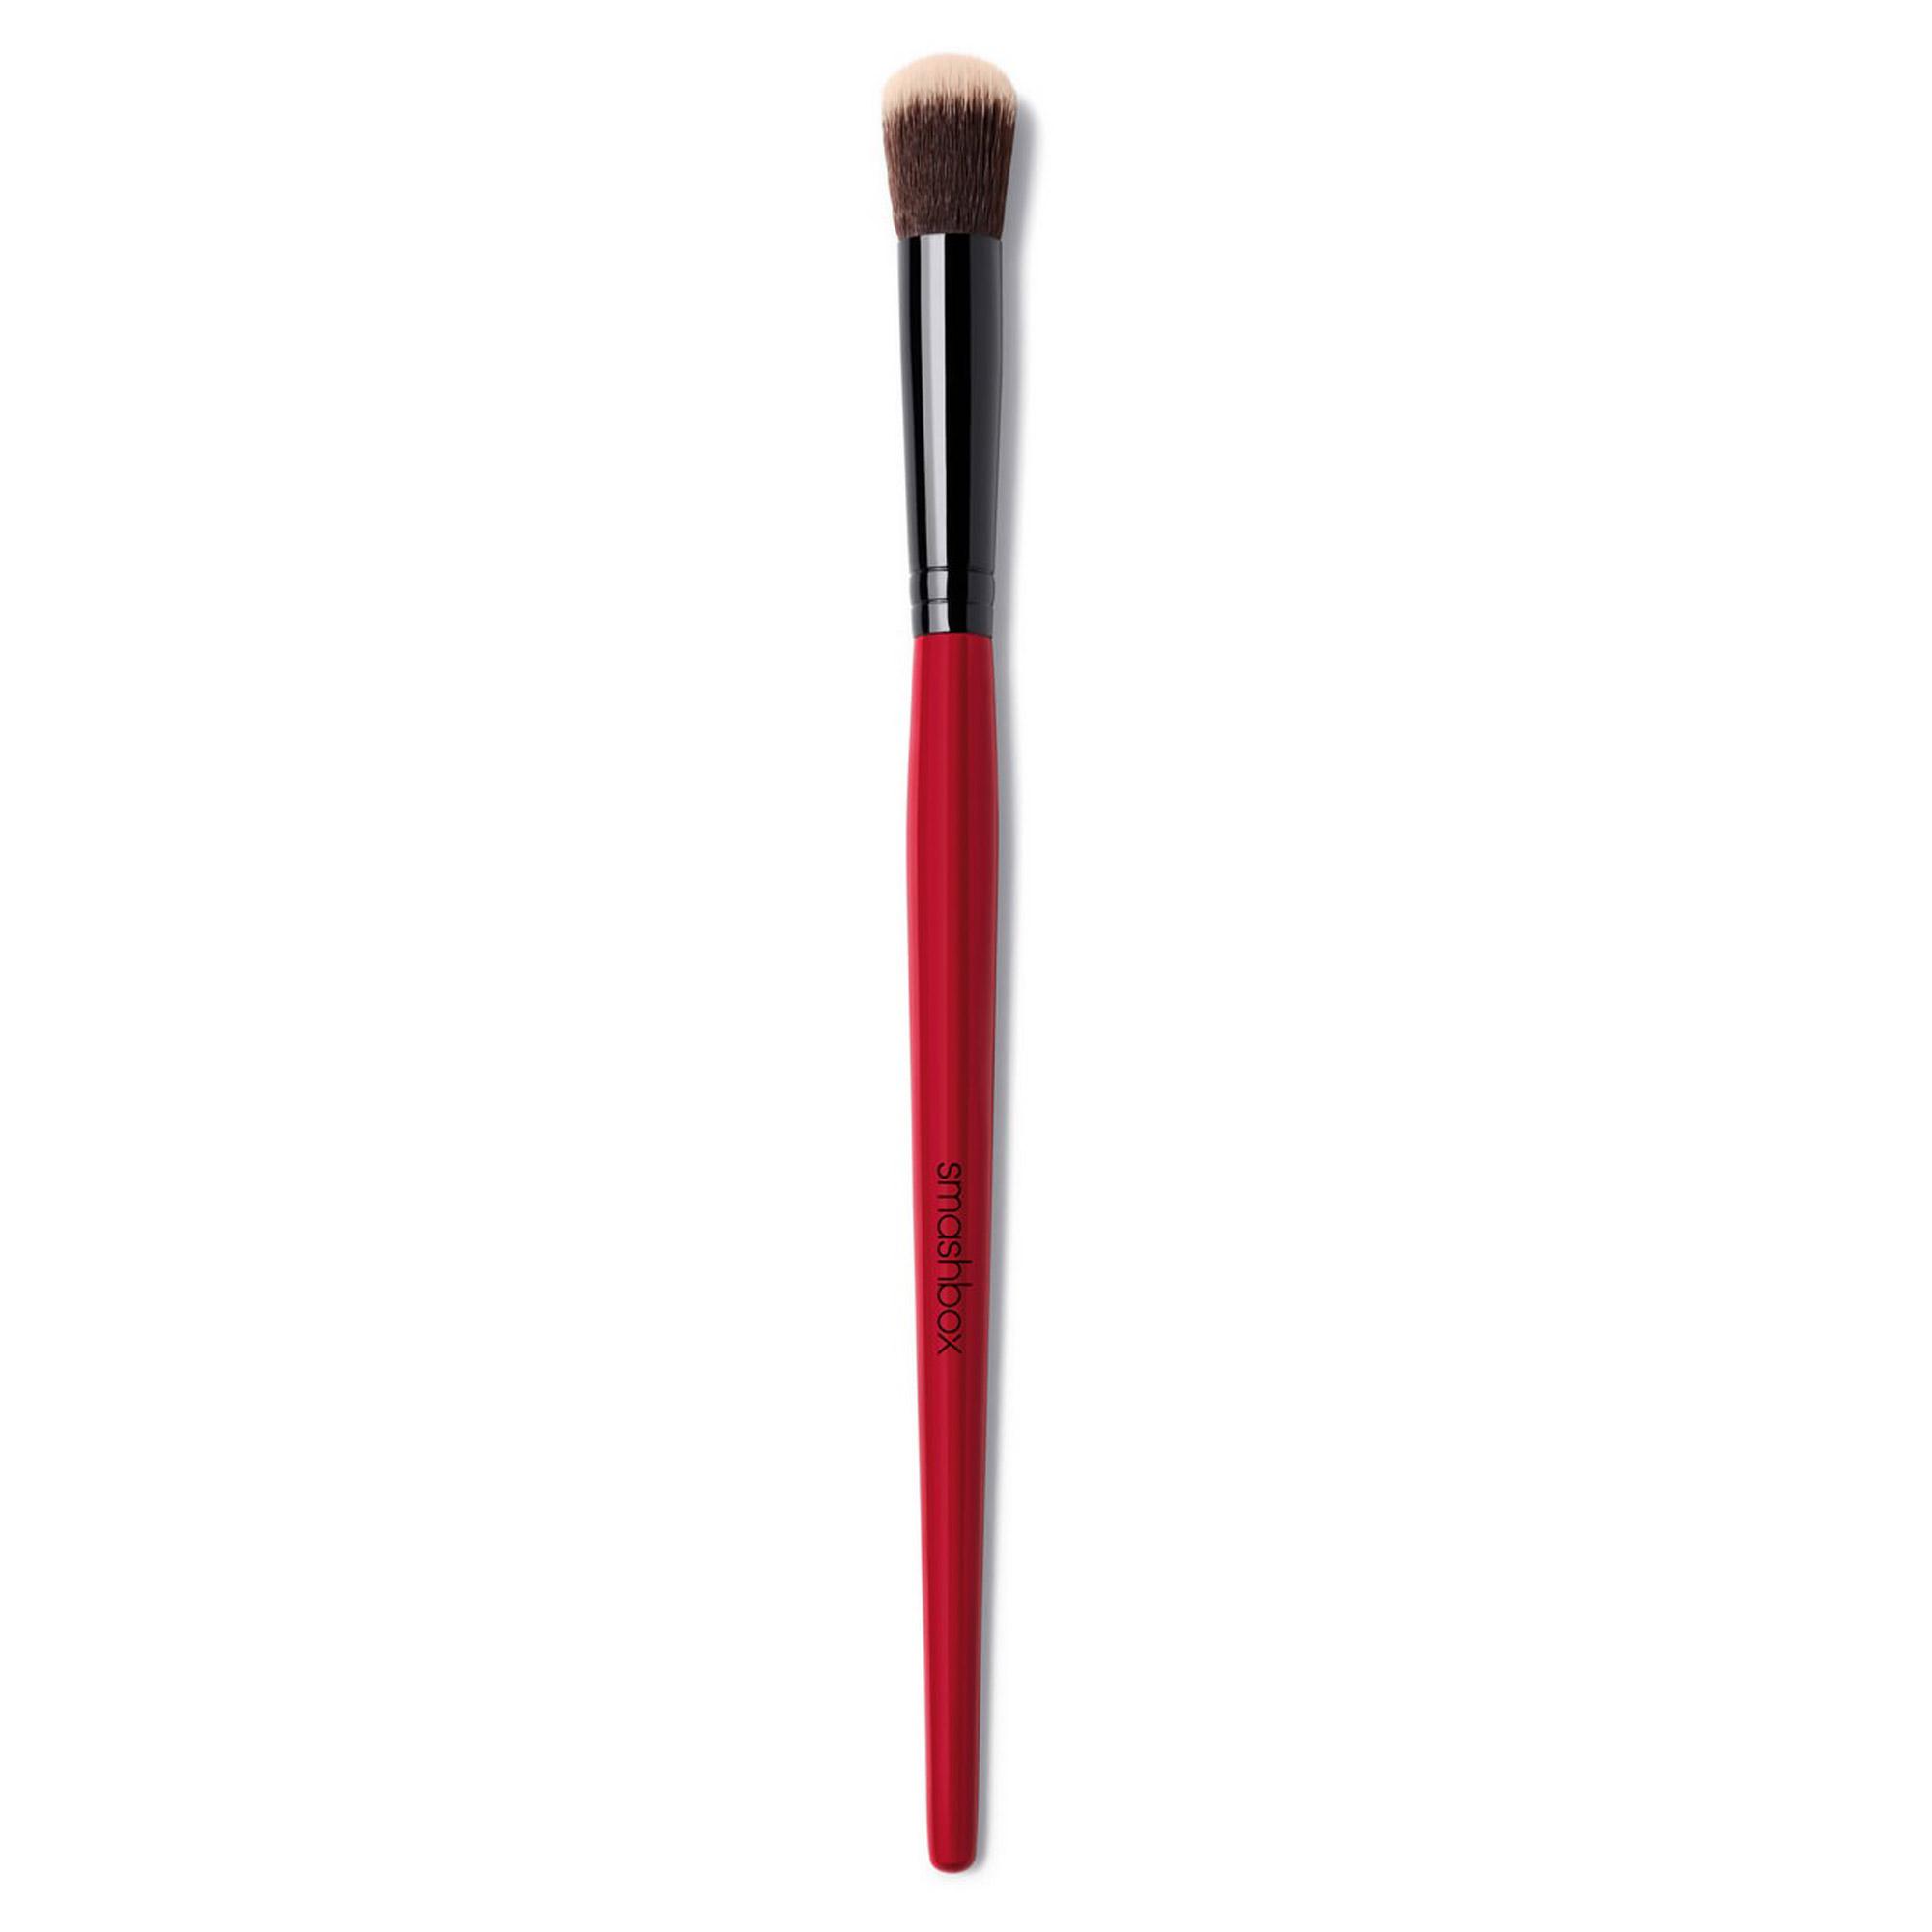 Blurring Concealer Brush